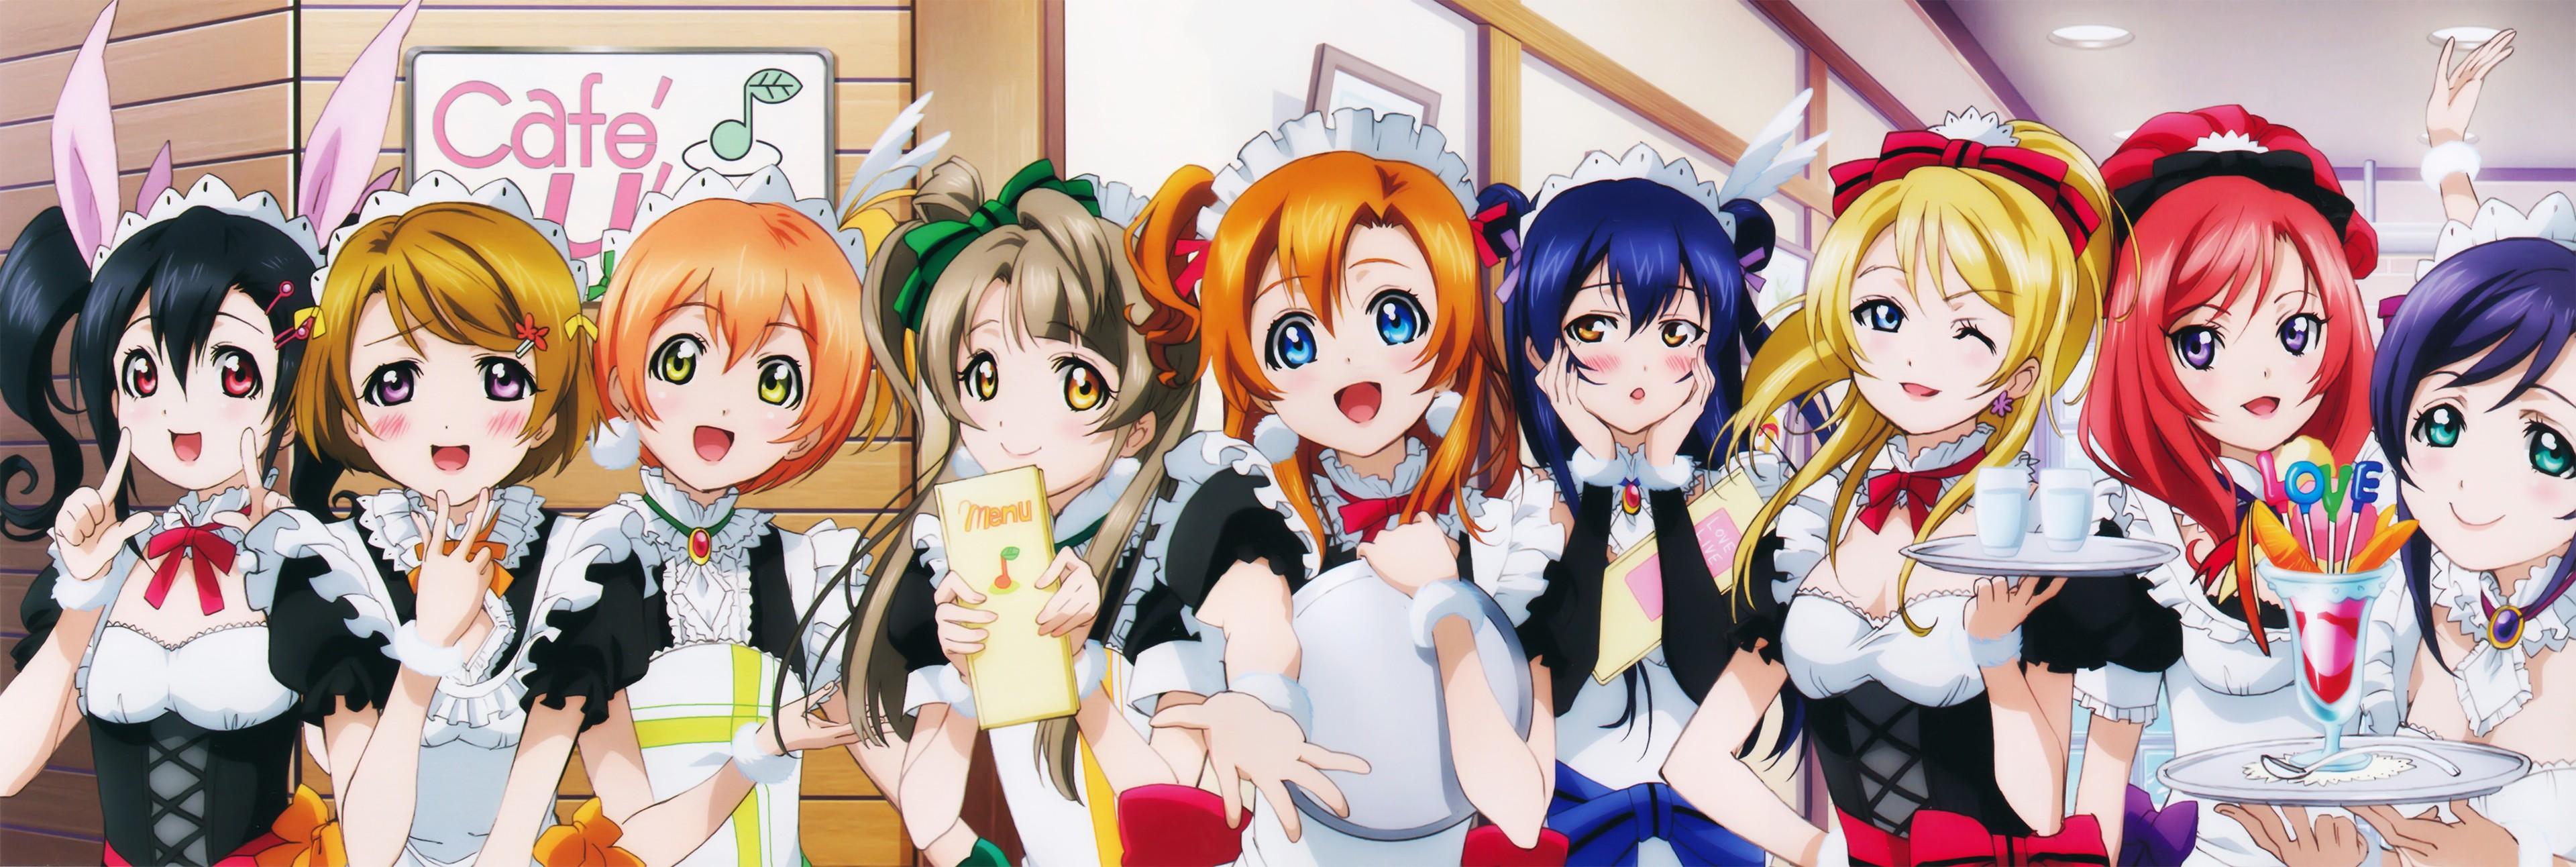 Anime 3840x1292 anime girls anime Love Live! Ayase Eri Hoshizora Rin Koizumi Hanayo Kousaka Honoka Minami Kotori Nishikino Maki Sonoda Umi Toujou Nozomi Yazawa Nico maid maid outfit group of women multiple display